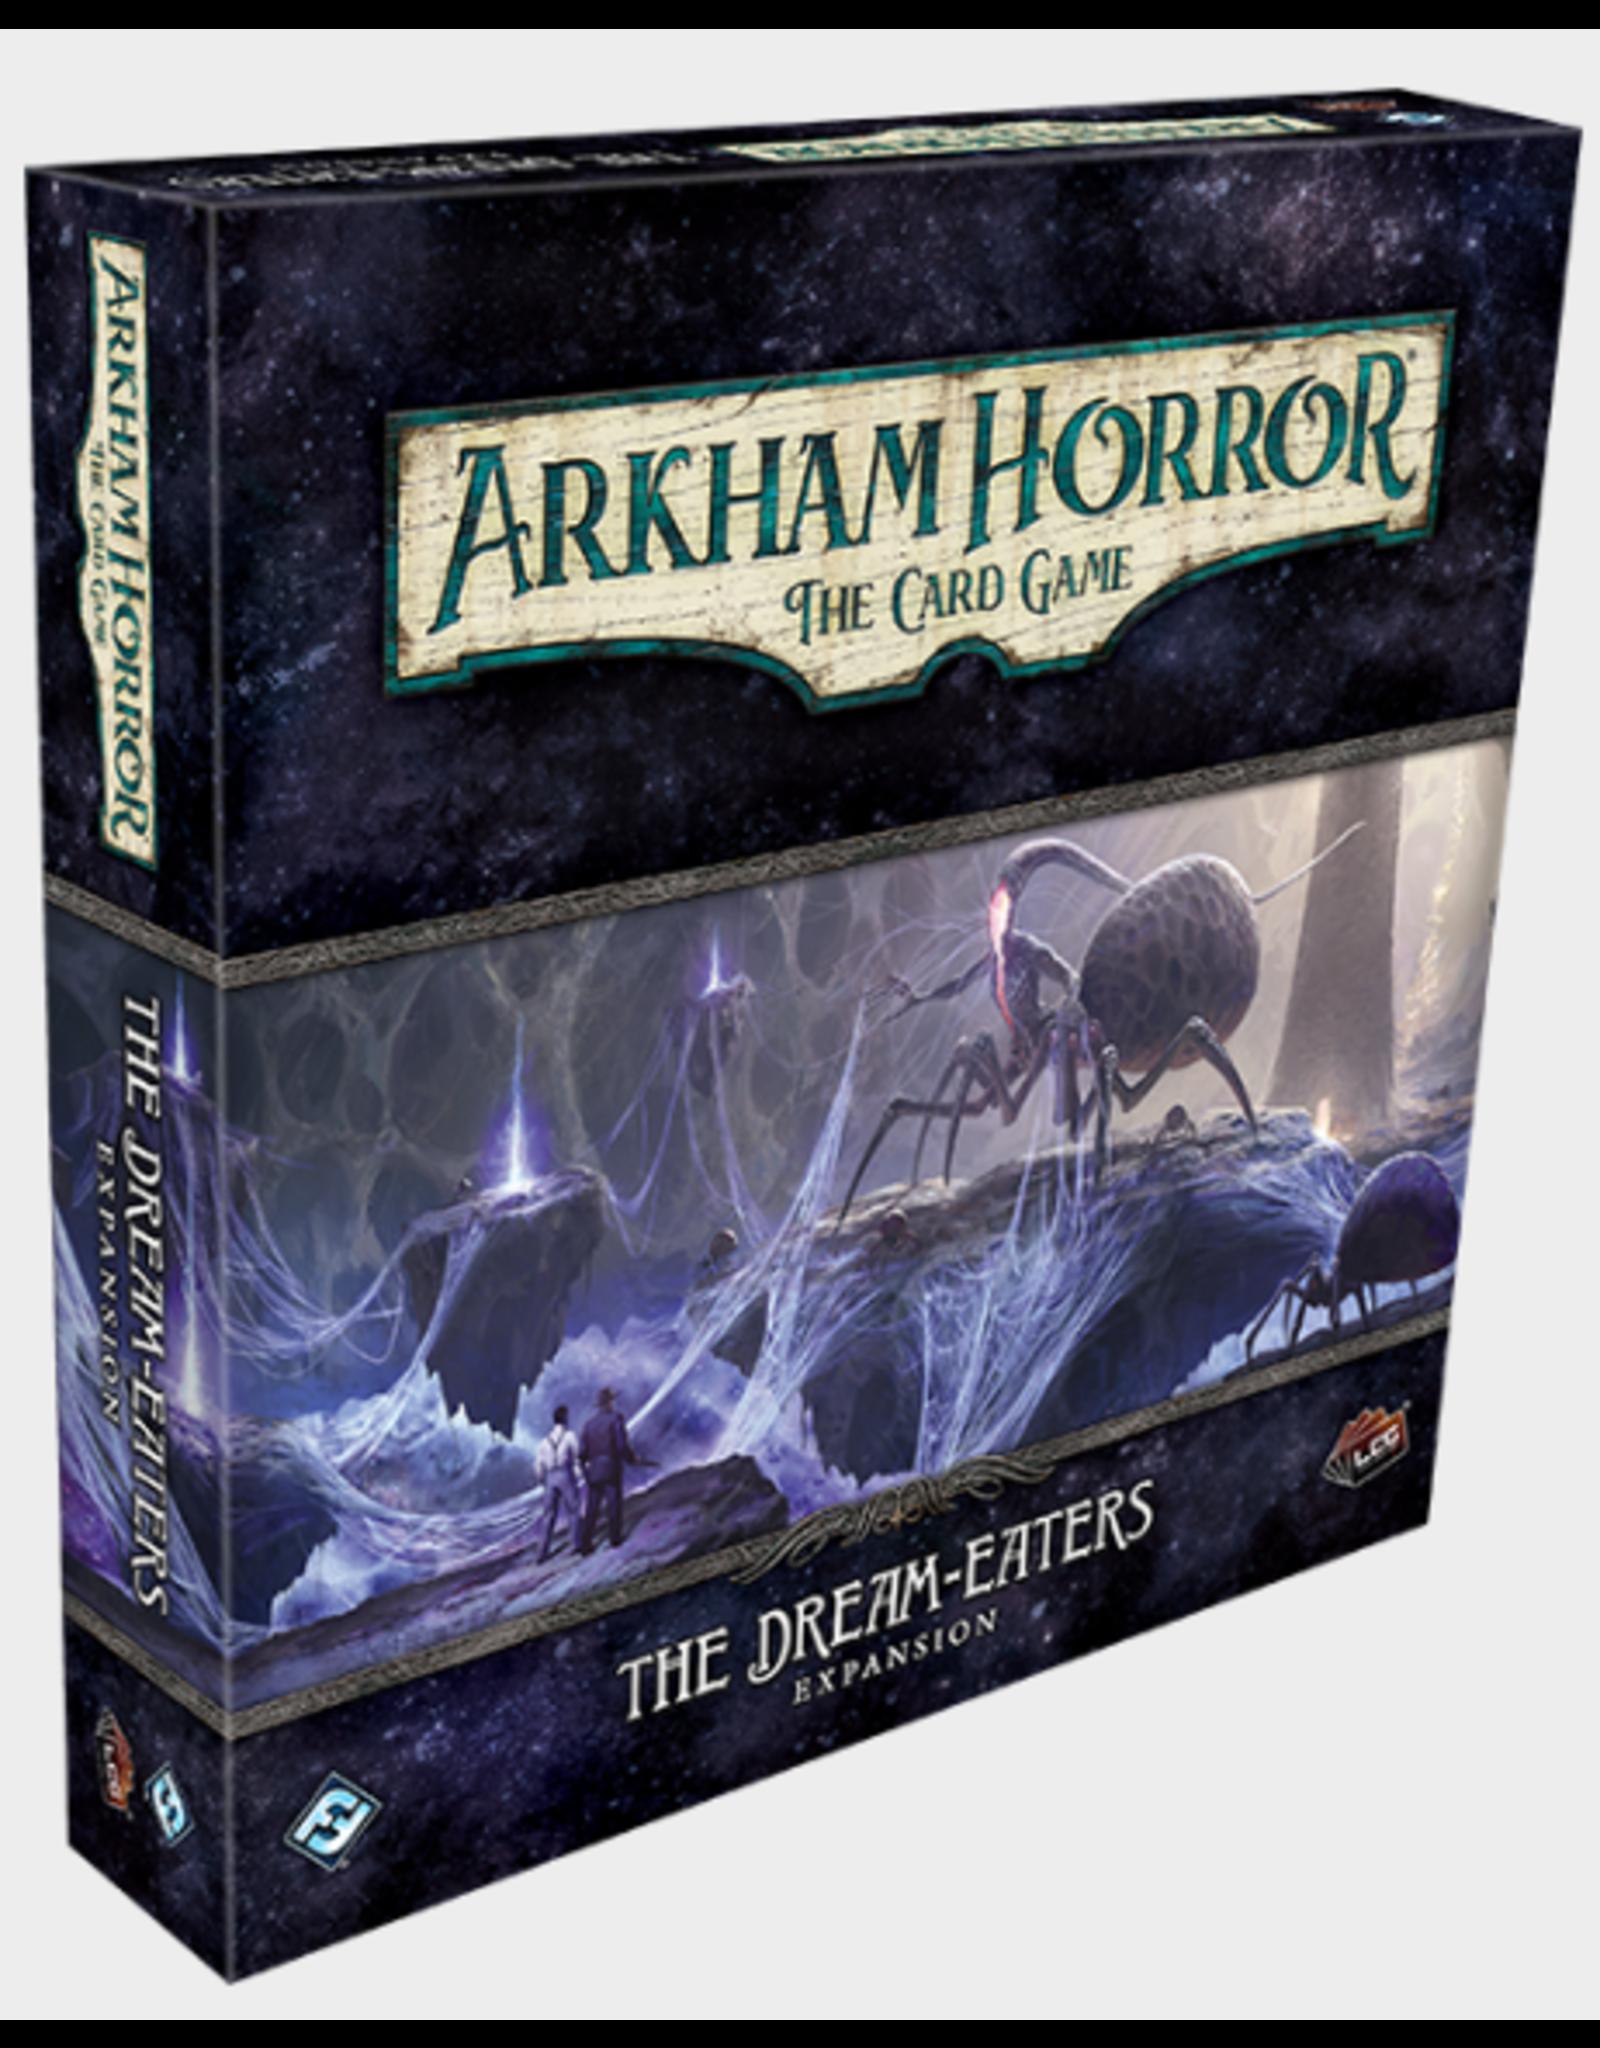 Fantasy Flight Games Arkham Horror LCG: The Dream-Eaters